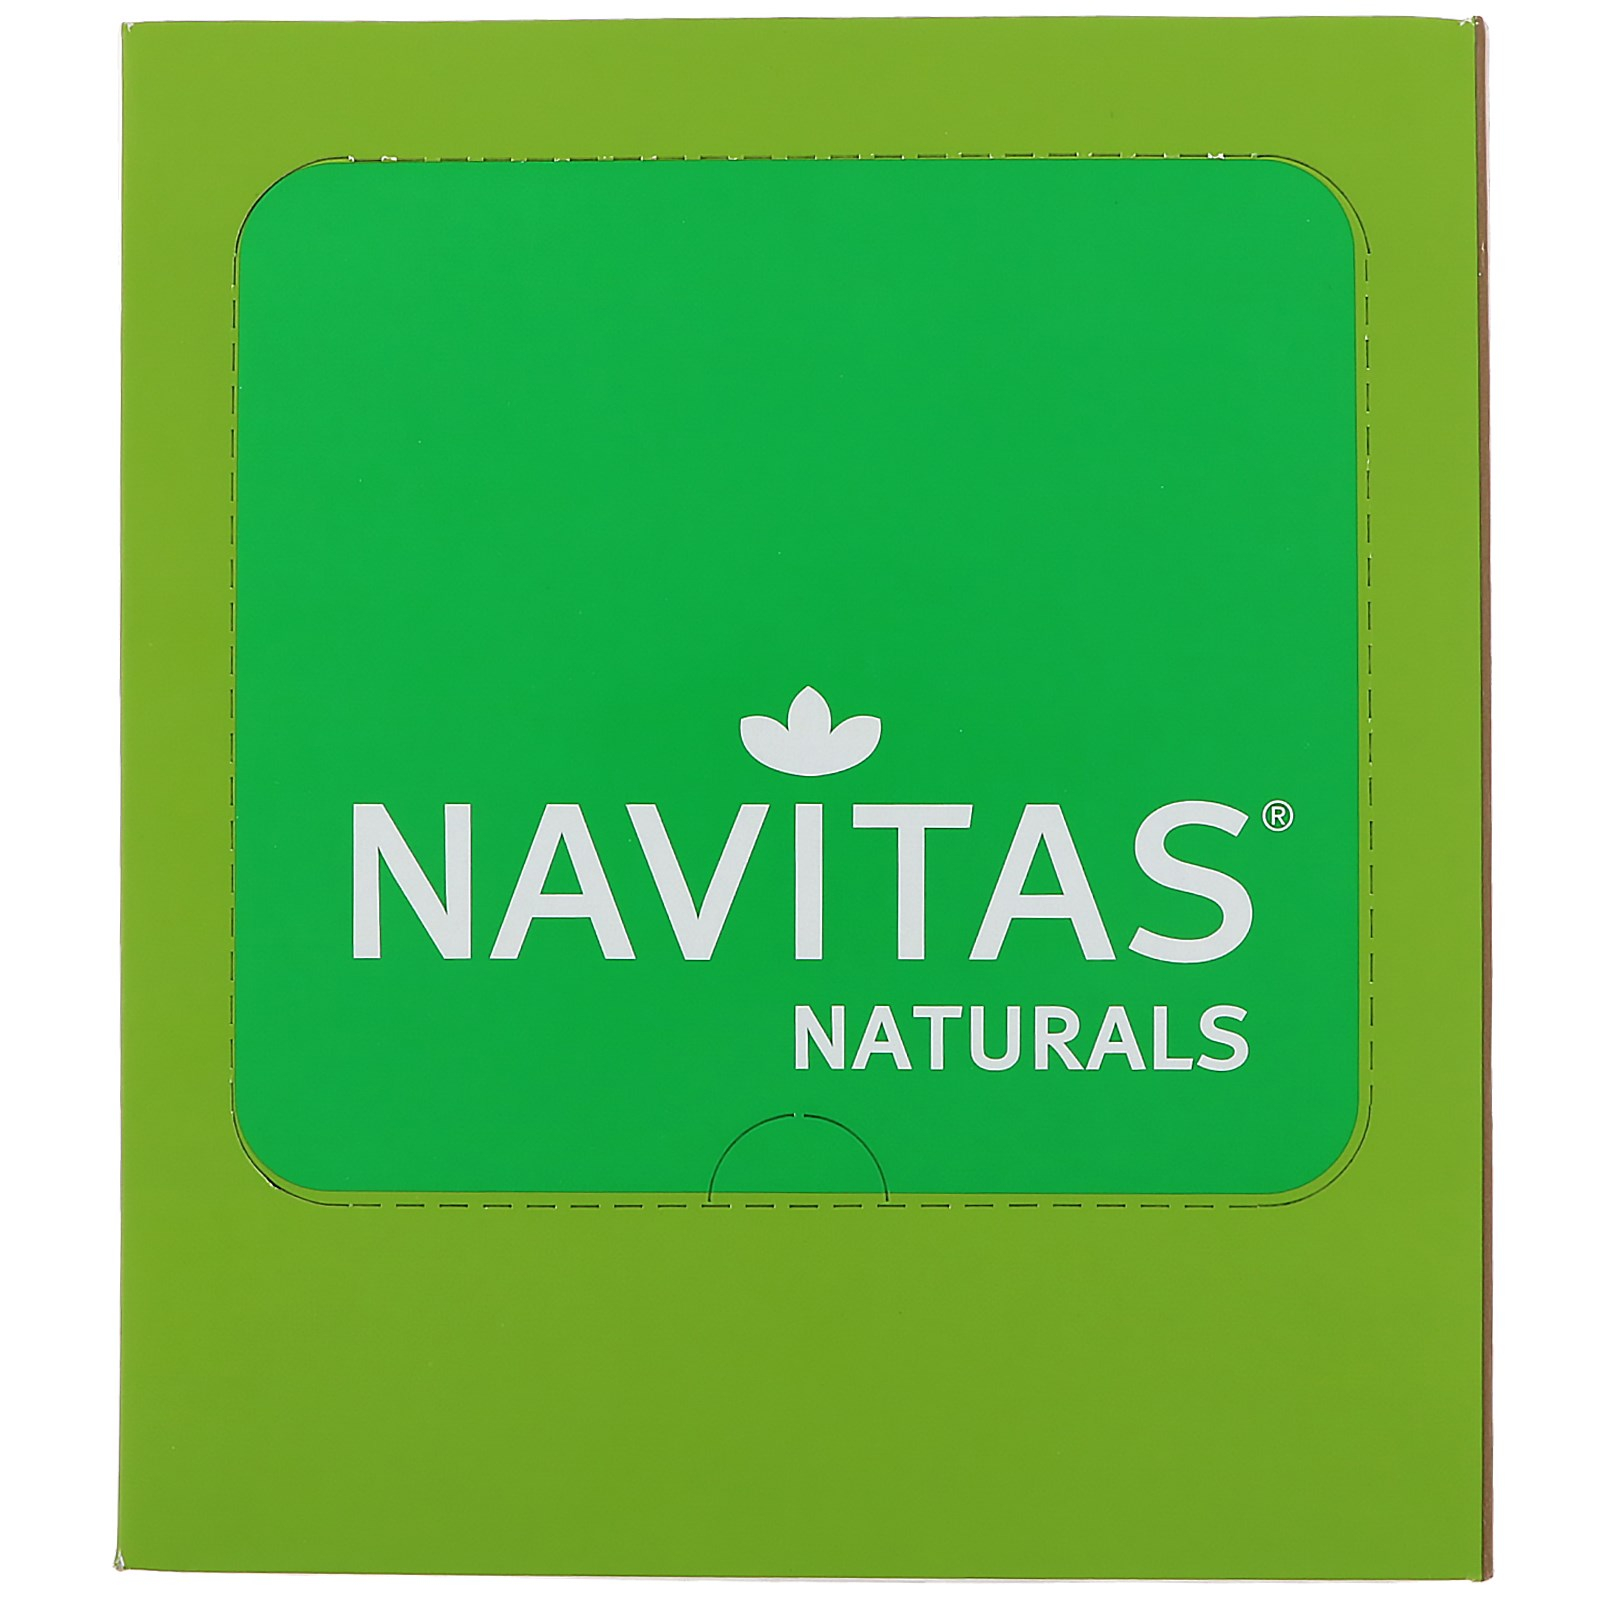 Navitas Organics, Superfood + Maca, Maca Maple, 12 Bars, 16.8 oz (480 g)